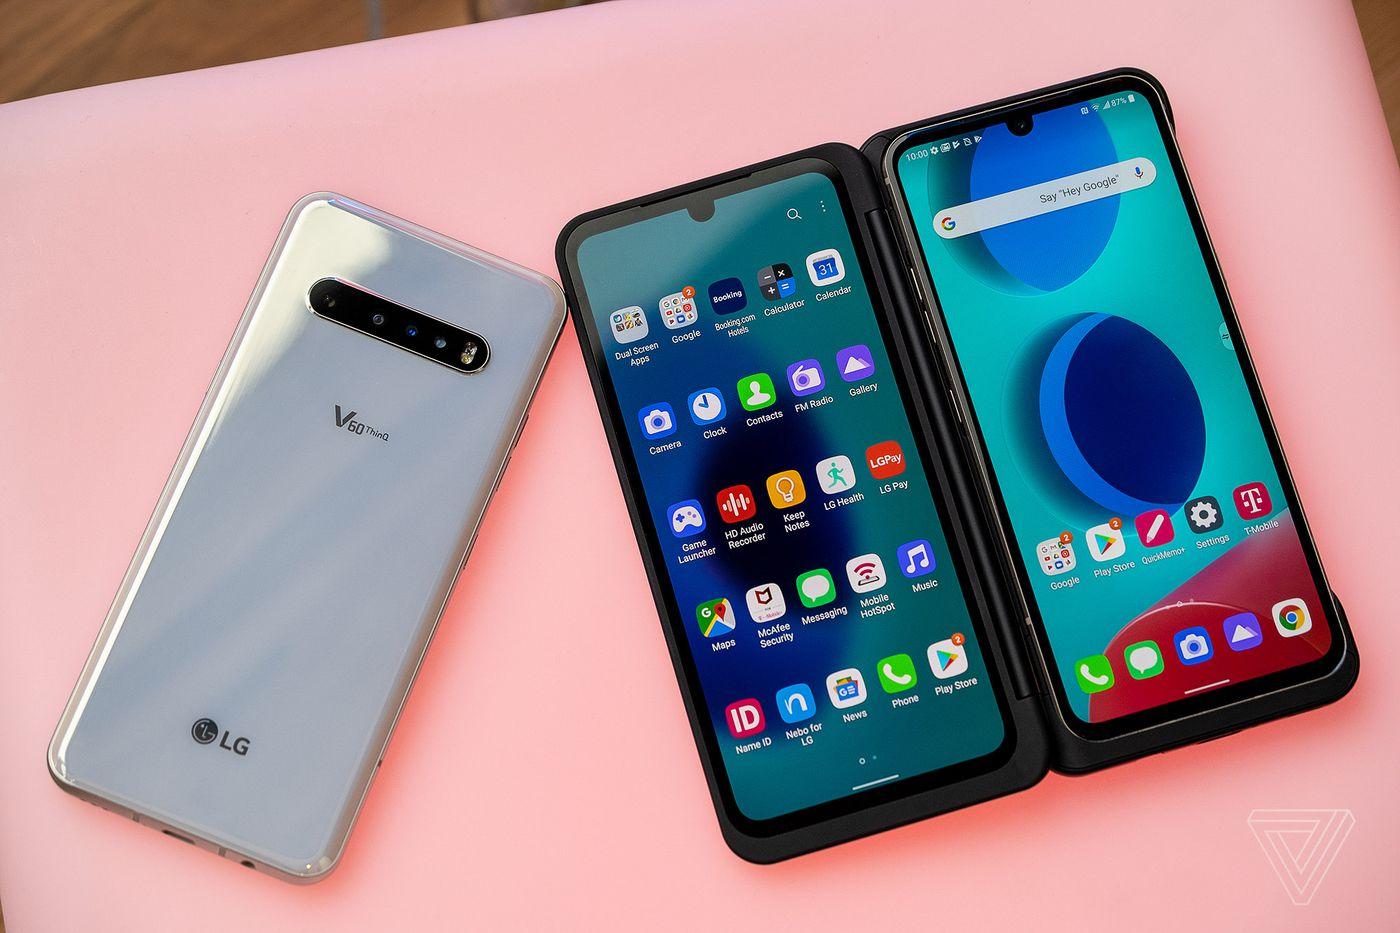 LG V60 ThinQ 5G sonunda Android 11 güncellemesini alıyor 2021